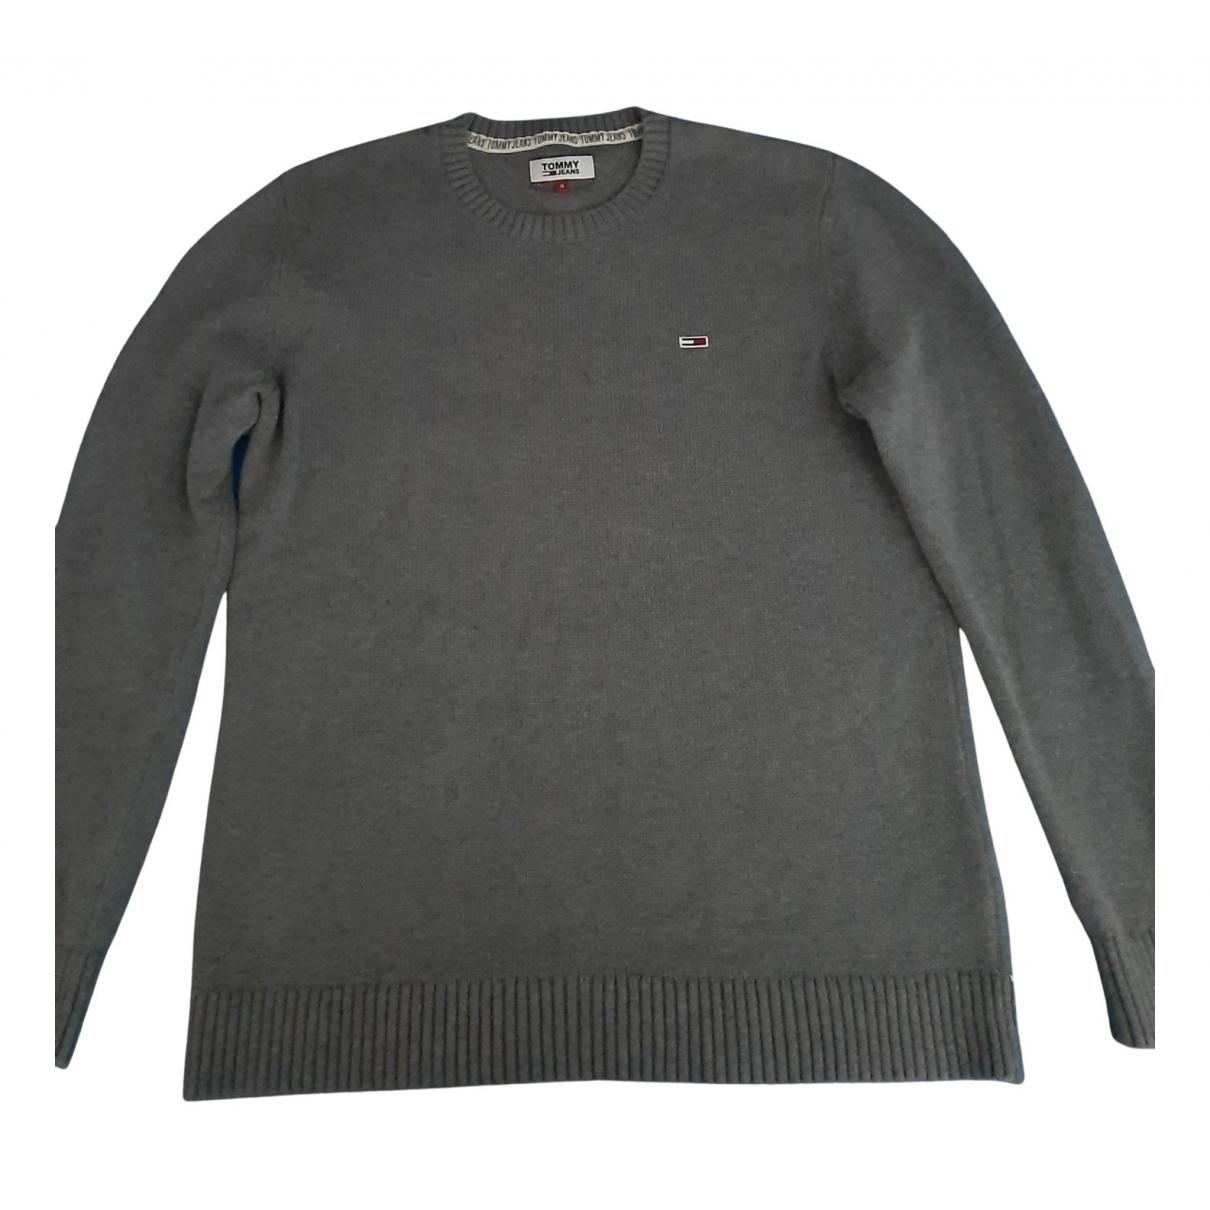 Tommy Hilfiger N Grey Cotton Knitwear & Sweatshirts for Men S International